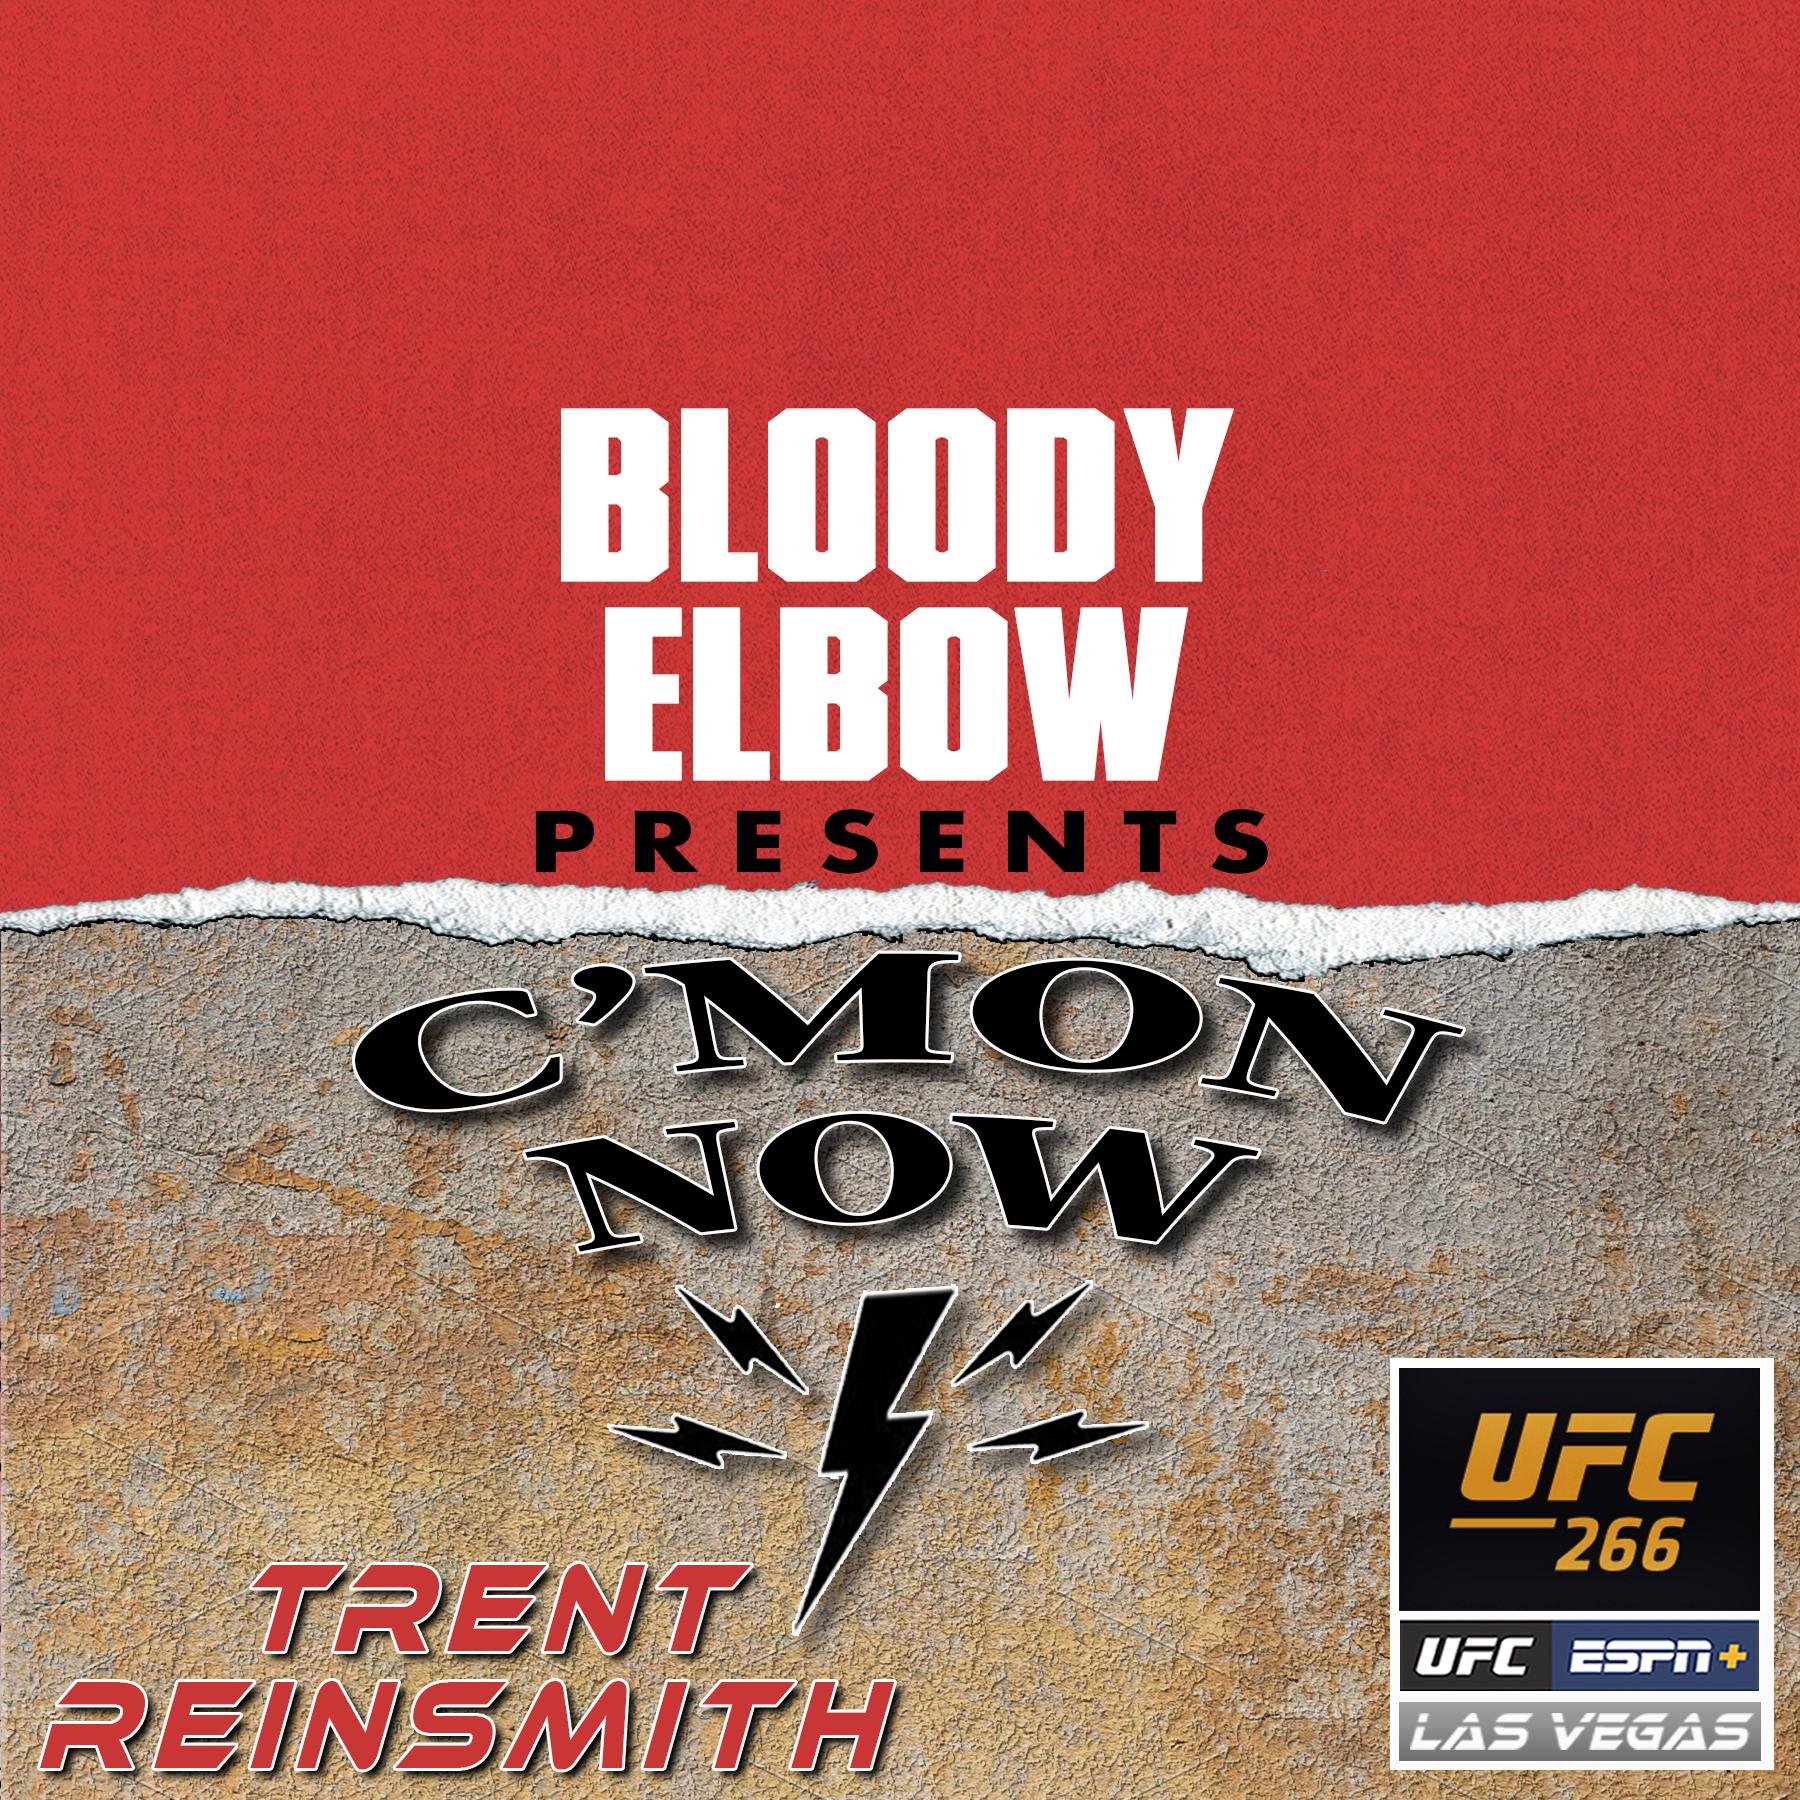 UFC Podcast, UFC Vegas, C'Mon Now MMA Podcast, Trent Reinsmith, UFC News, UFC Editorial, MMA Podcast, UFC 266, Alexander Volkanovski vs Brian Ortega,